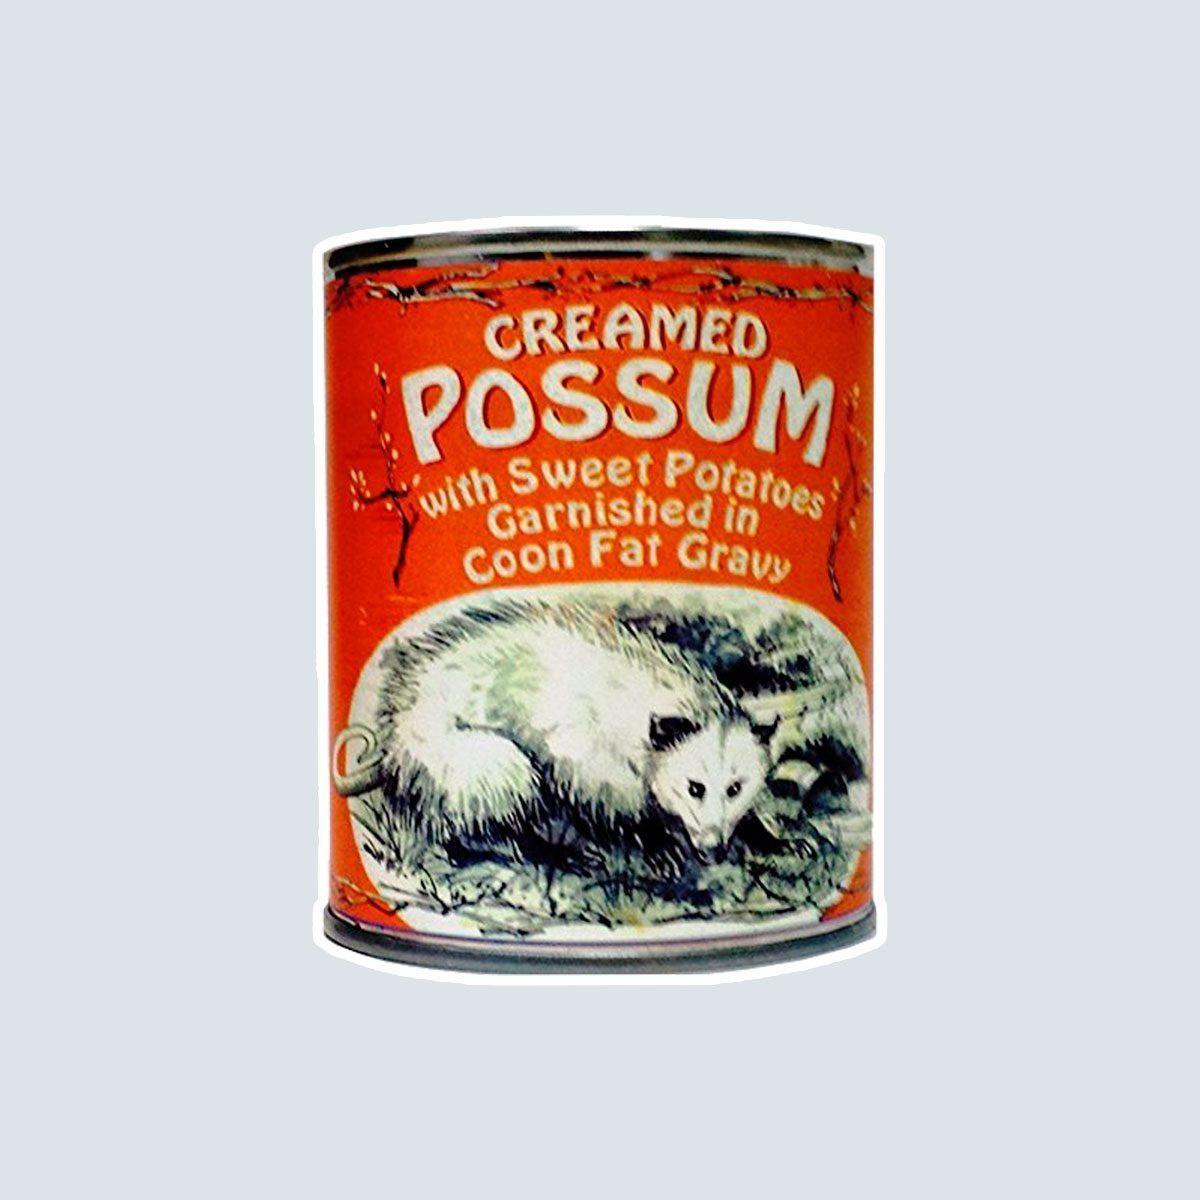 Creamed Possum